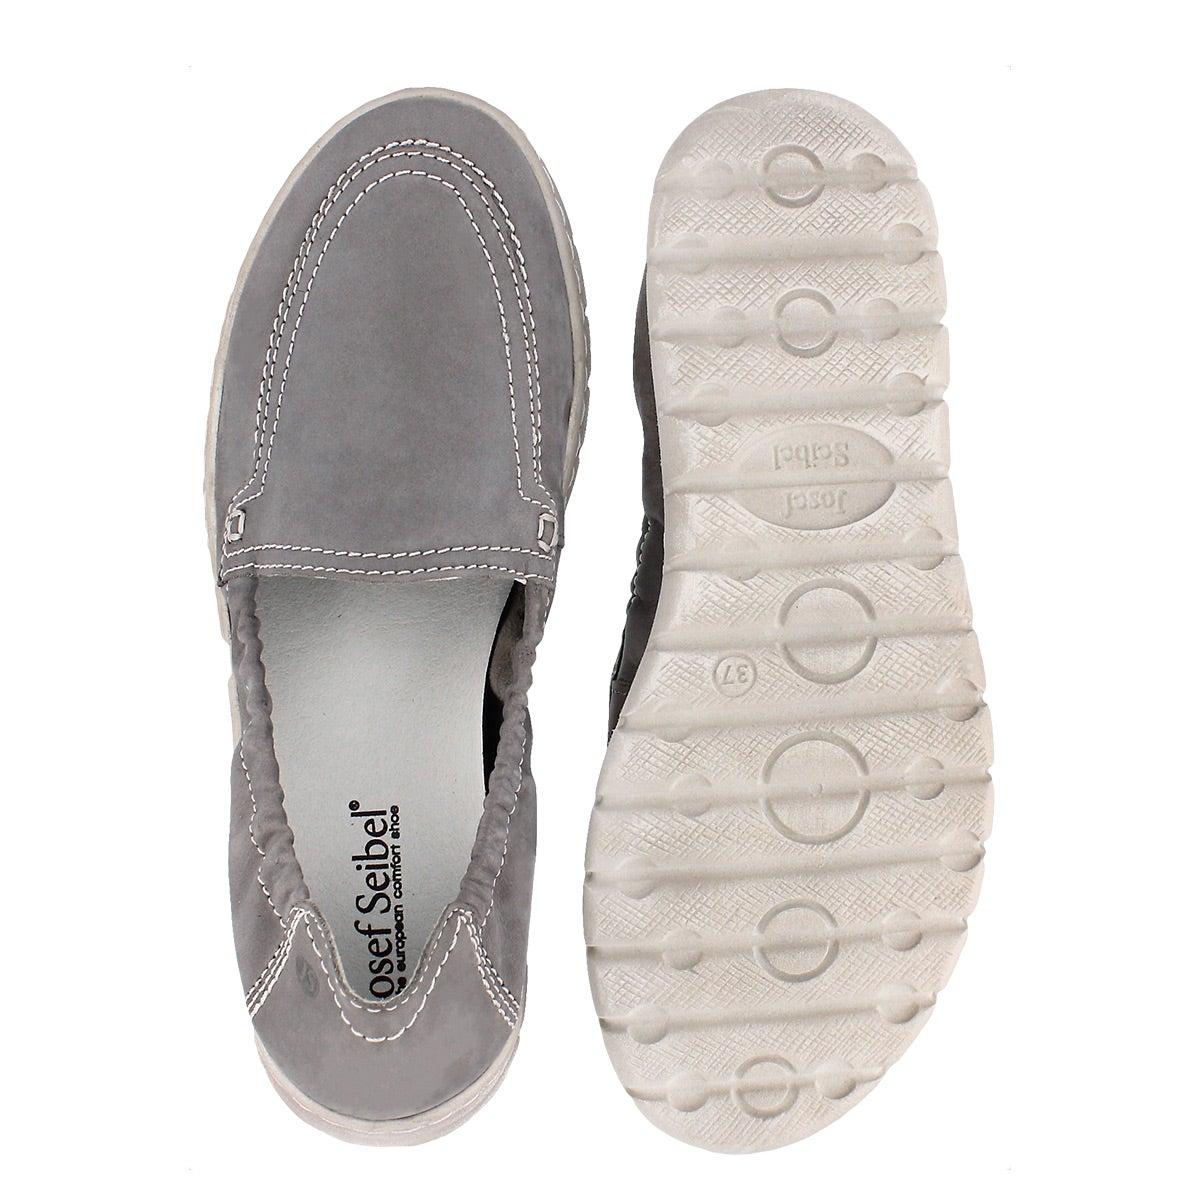 Lds Steffi 57 anthrazit slip on shoe